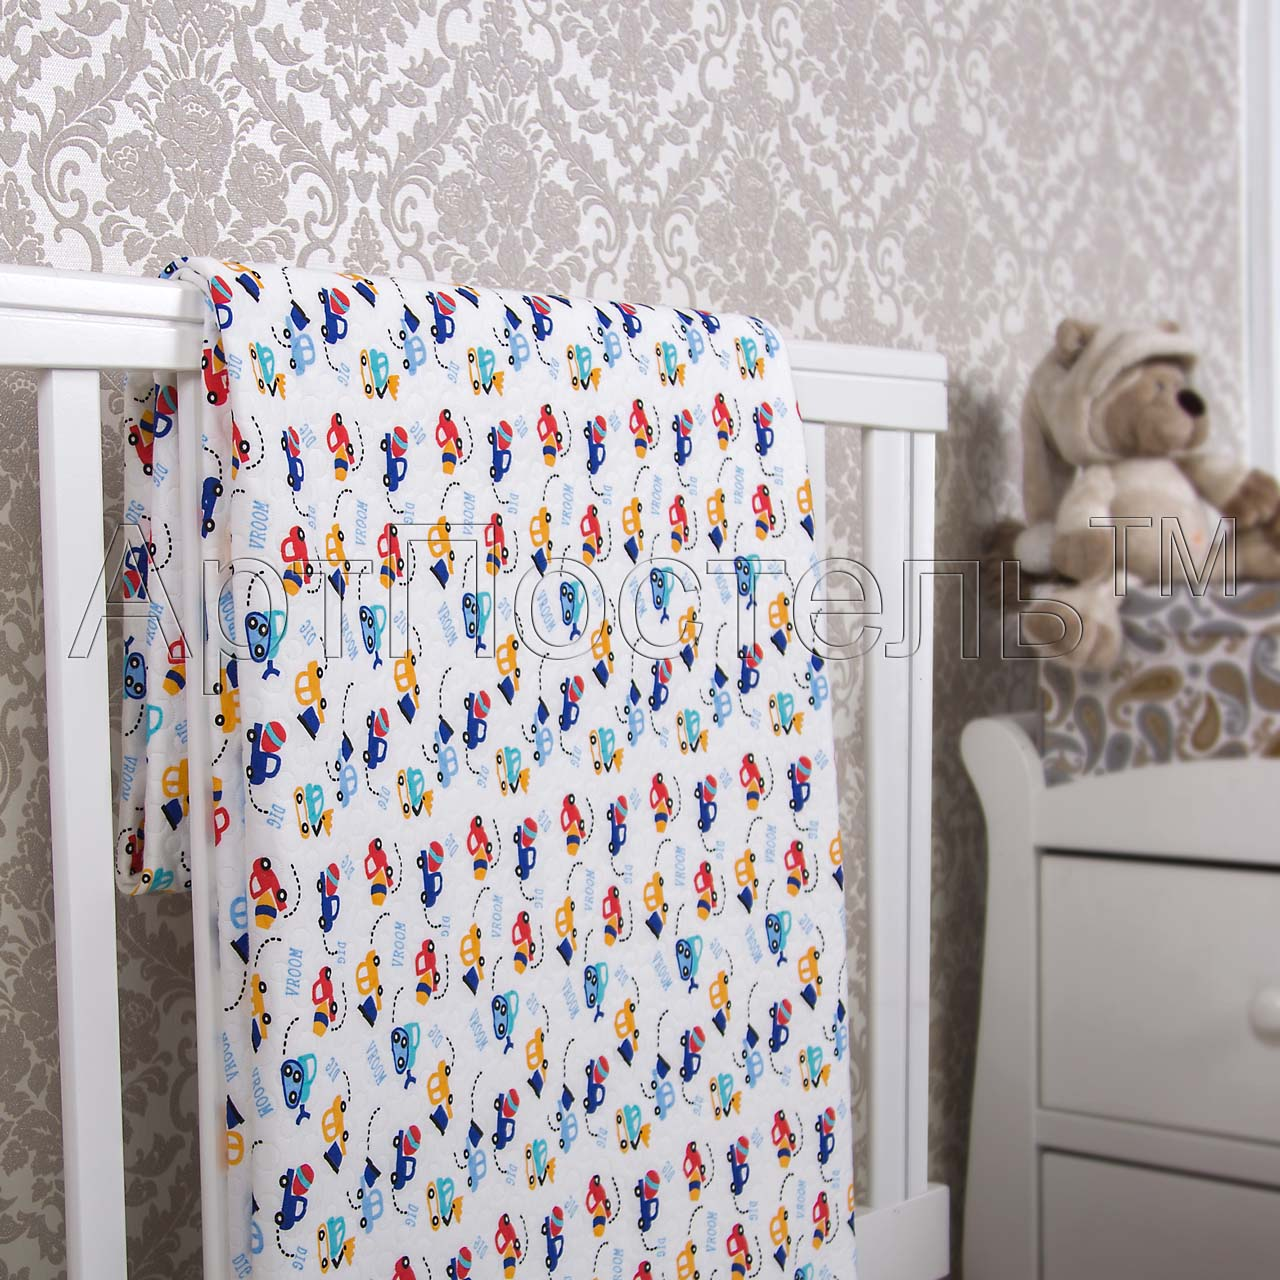 Покрывало  Забавные машинки  р. 140х200 - Текстиль для дома артикул: 33981